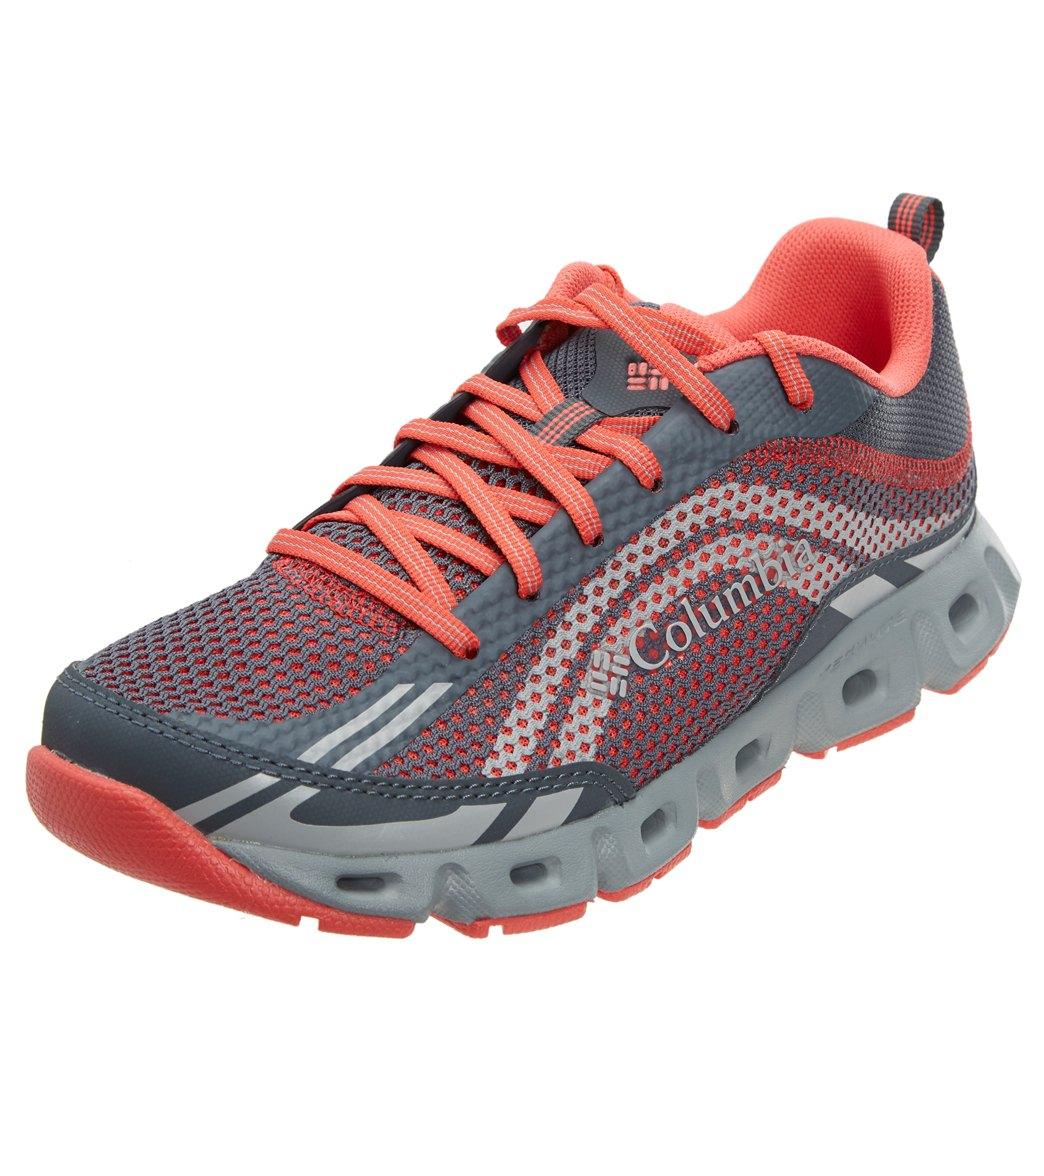 Columbia Women's Drainmaker Iv Hybrid Shoe - Graphite Red Coral 7.5 Graphite - Swimoutlet.com